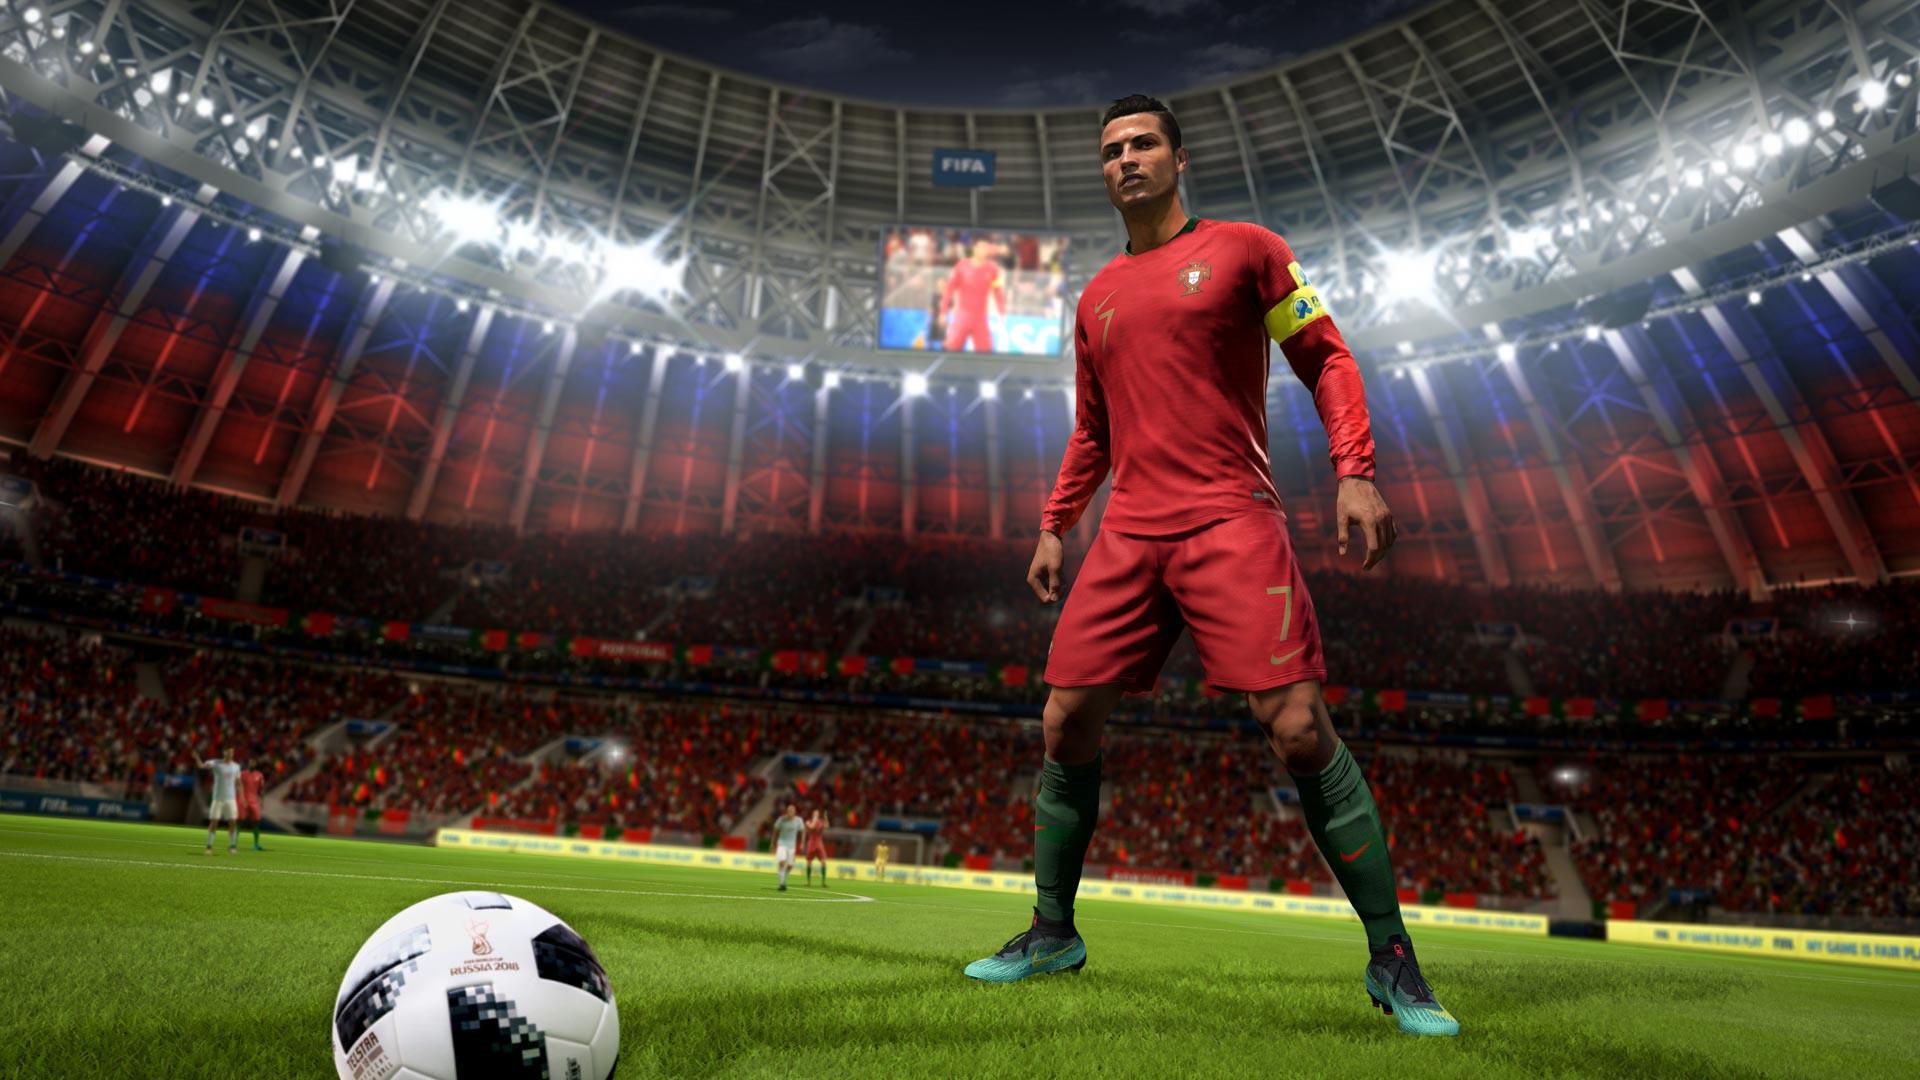 Fifa-18-EA-Sports-Tech-Princess